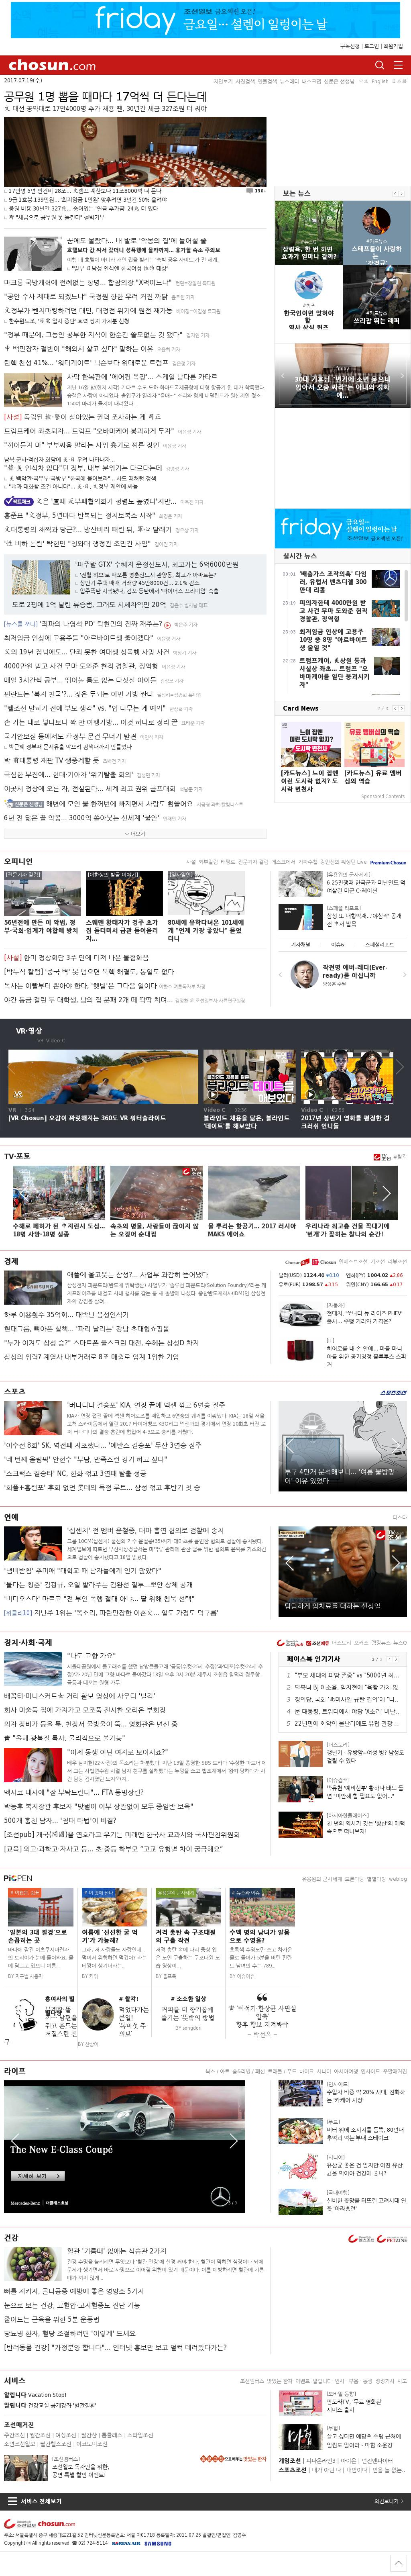 chosun.com at Wednesday July 19, 2017, 12:03 a.m. UTC